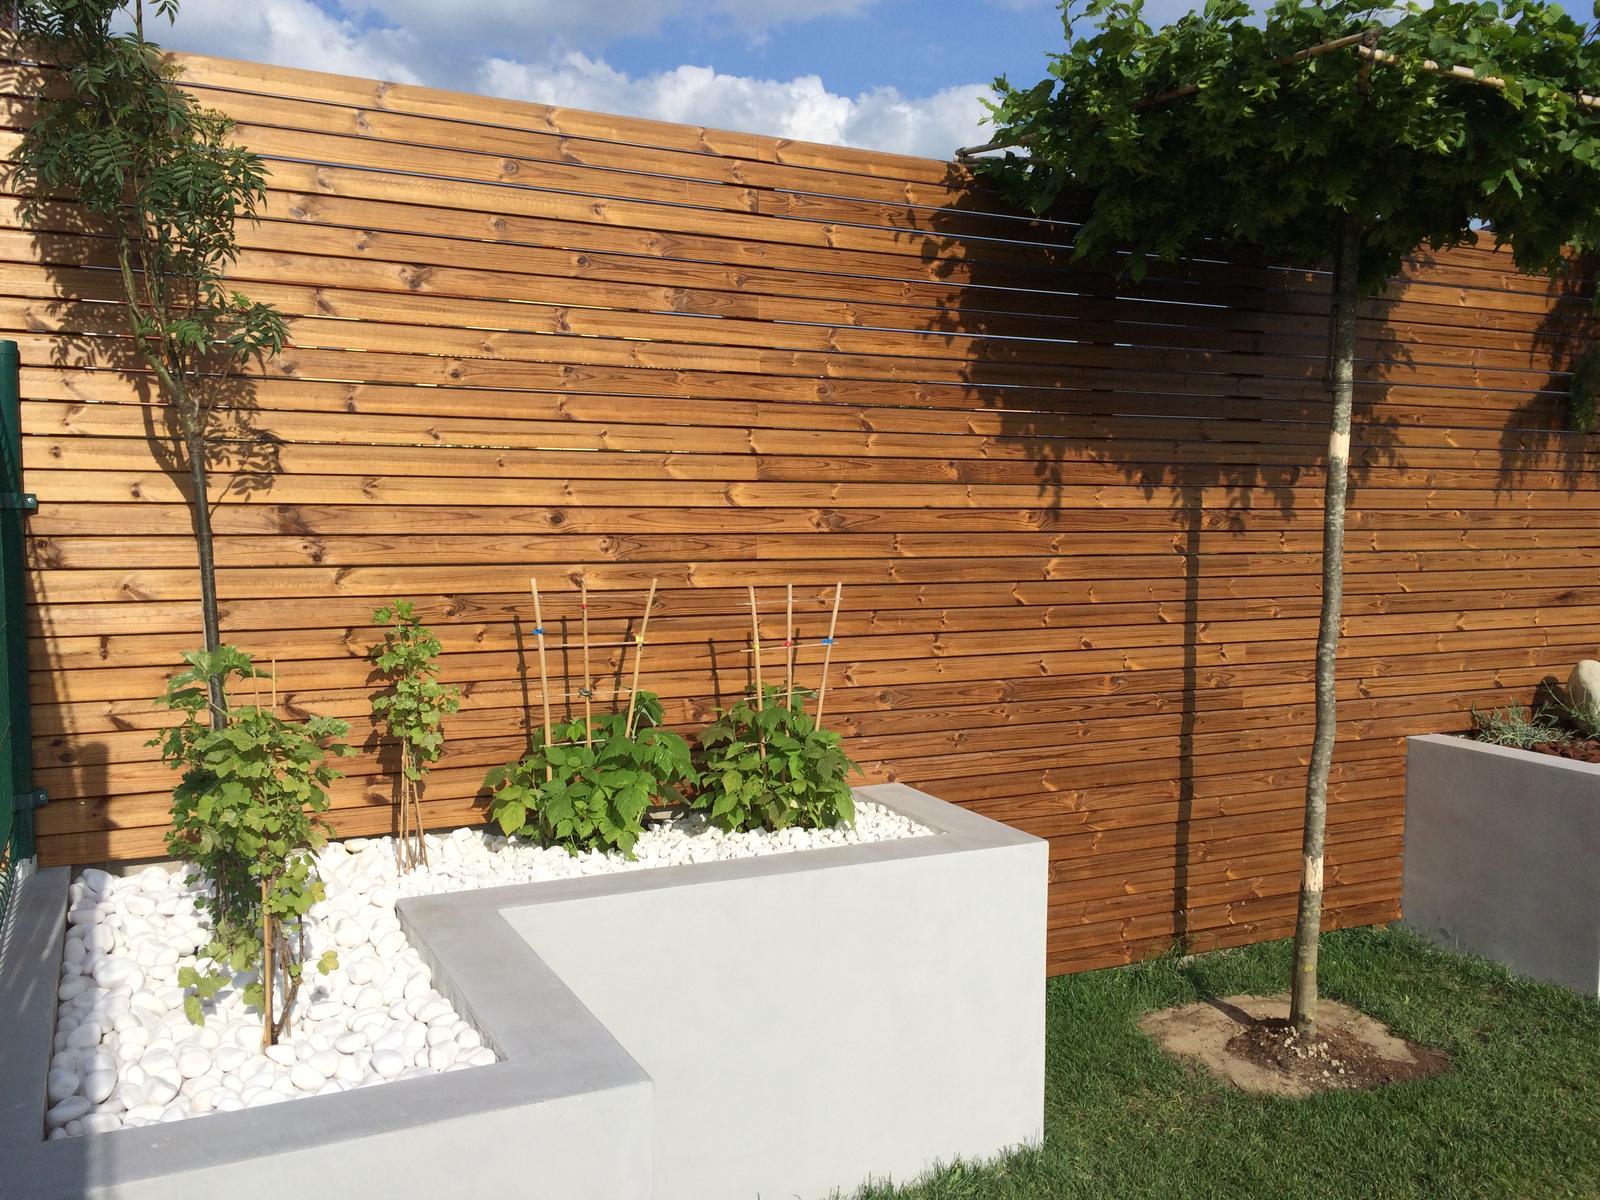 Zahradka - Obrázok č. 67